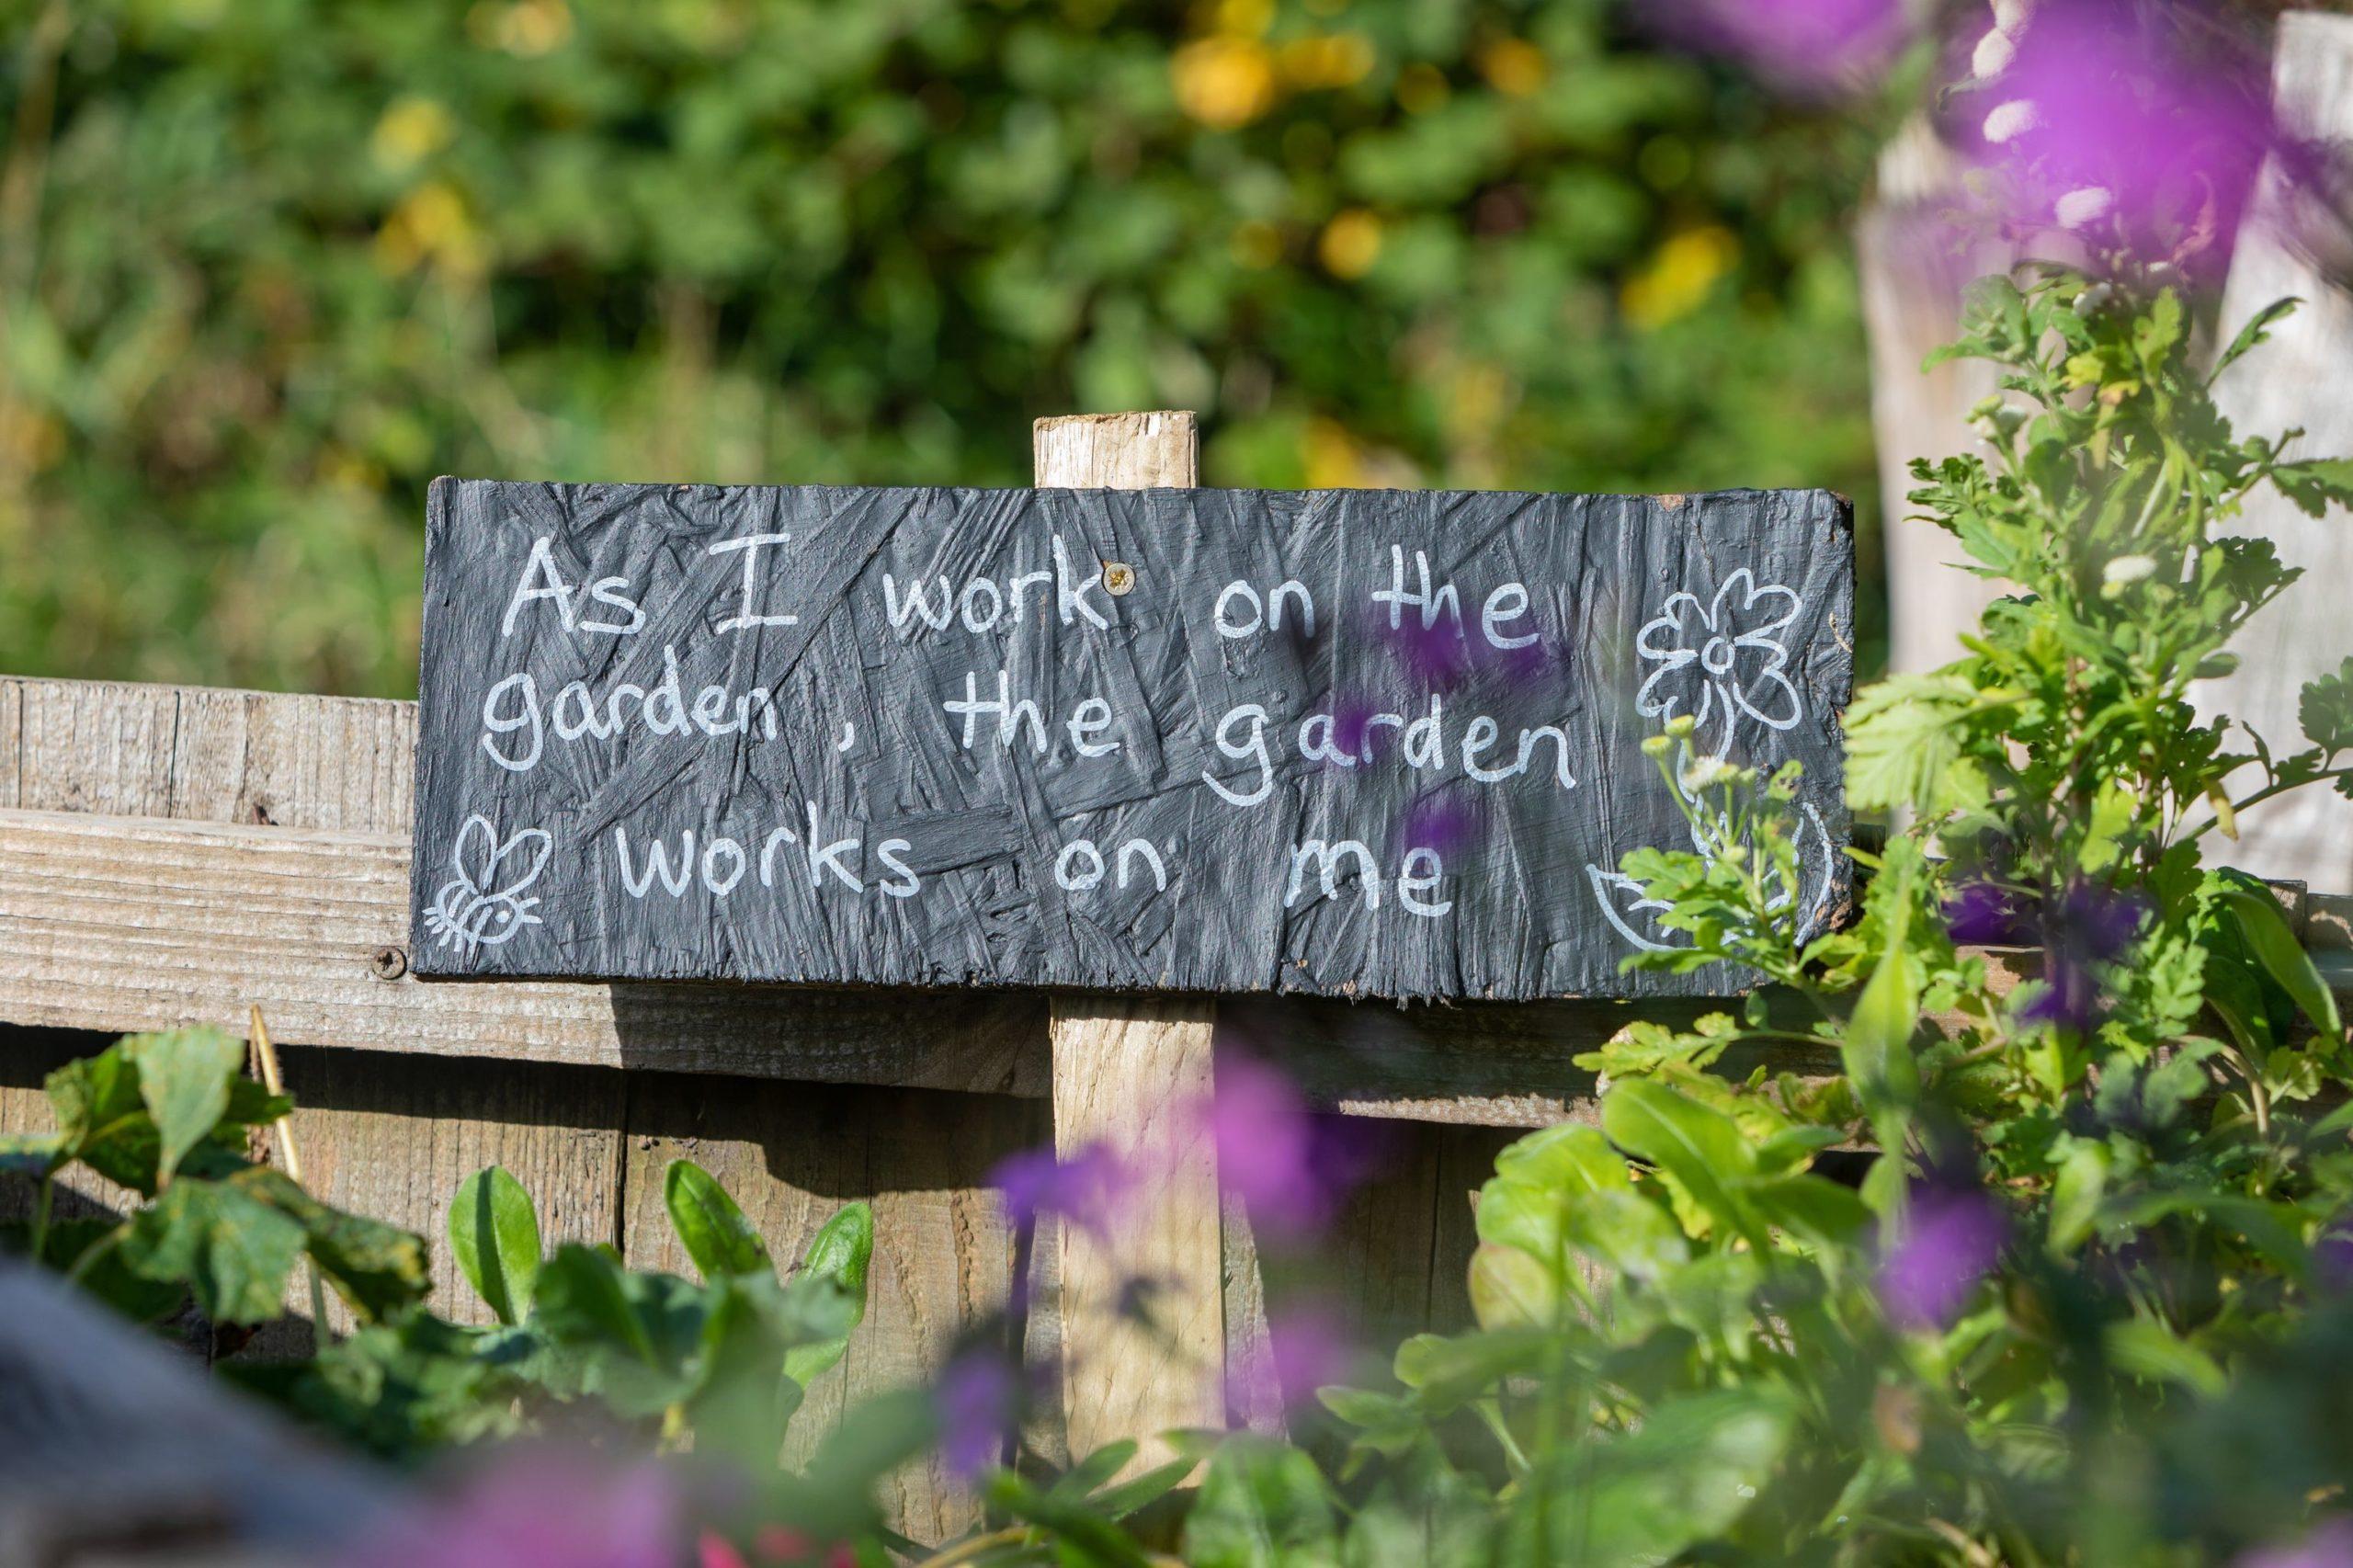 community gardening therapy